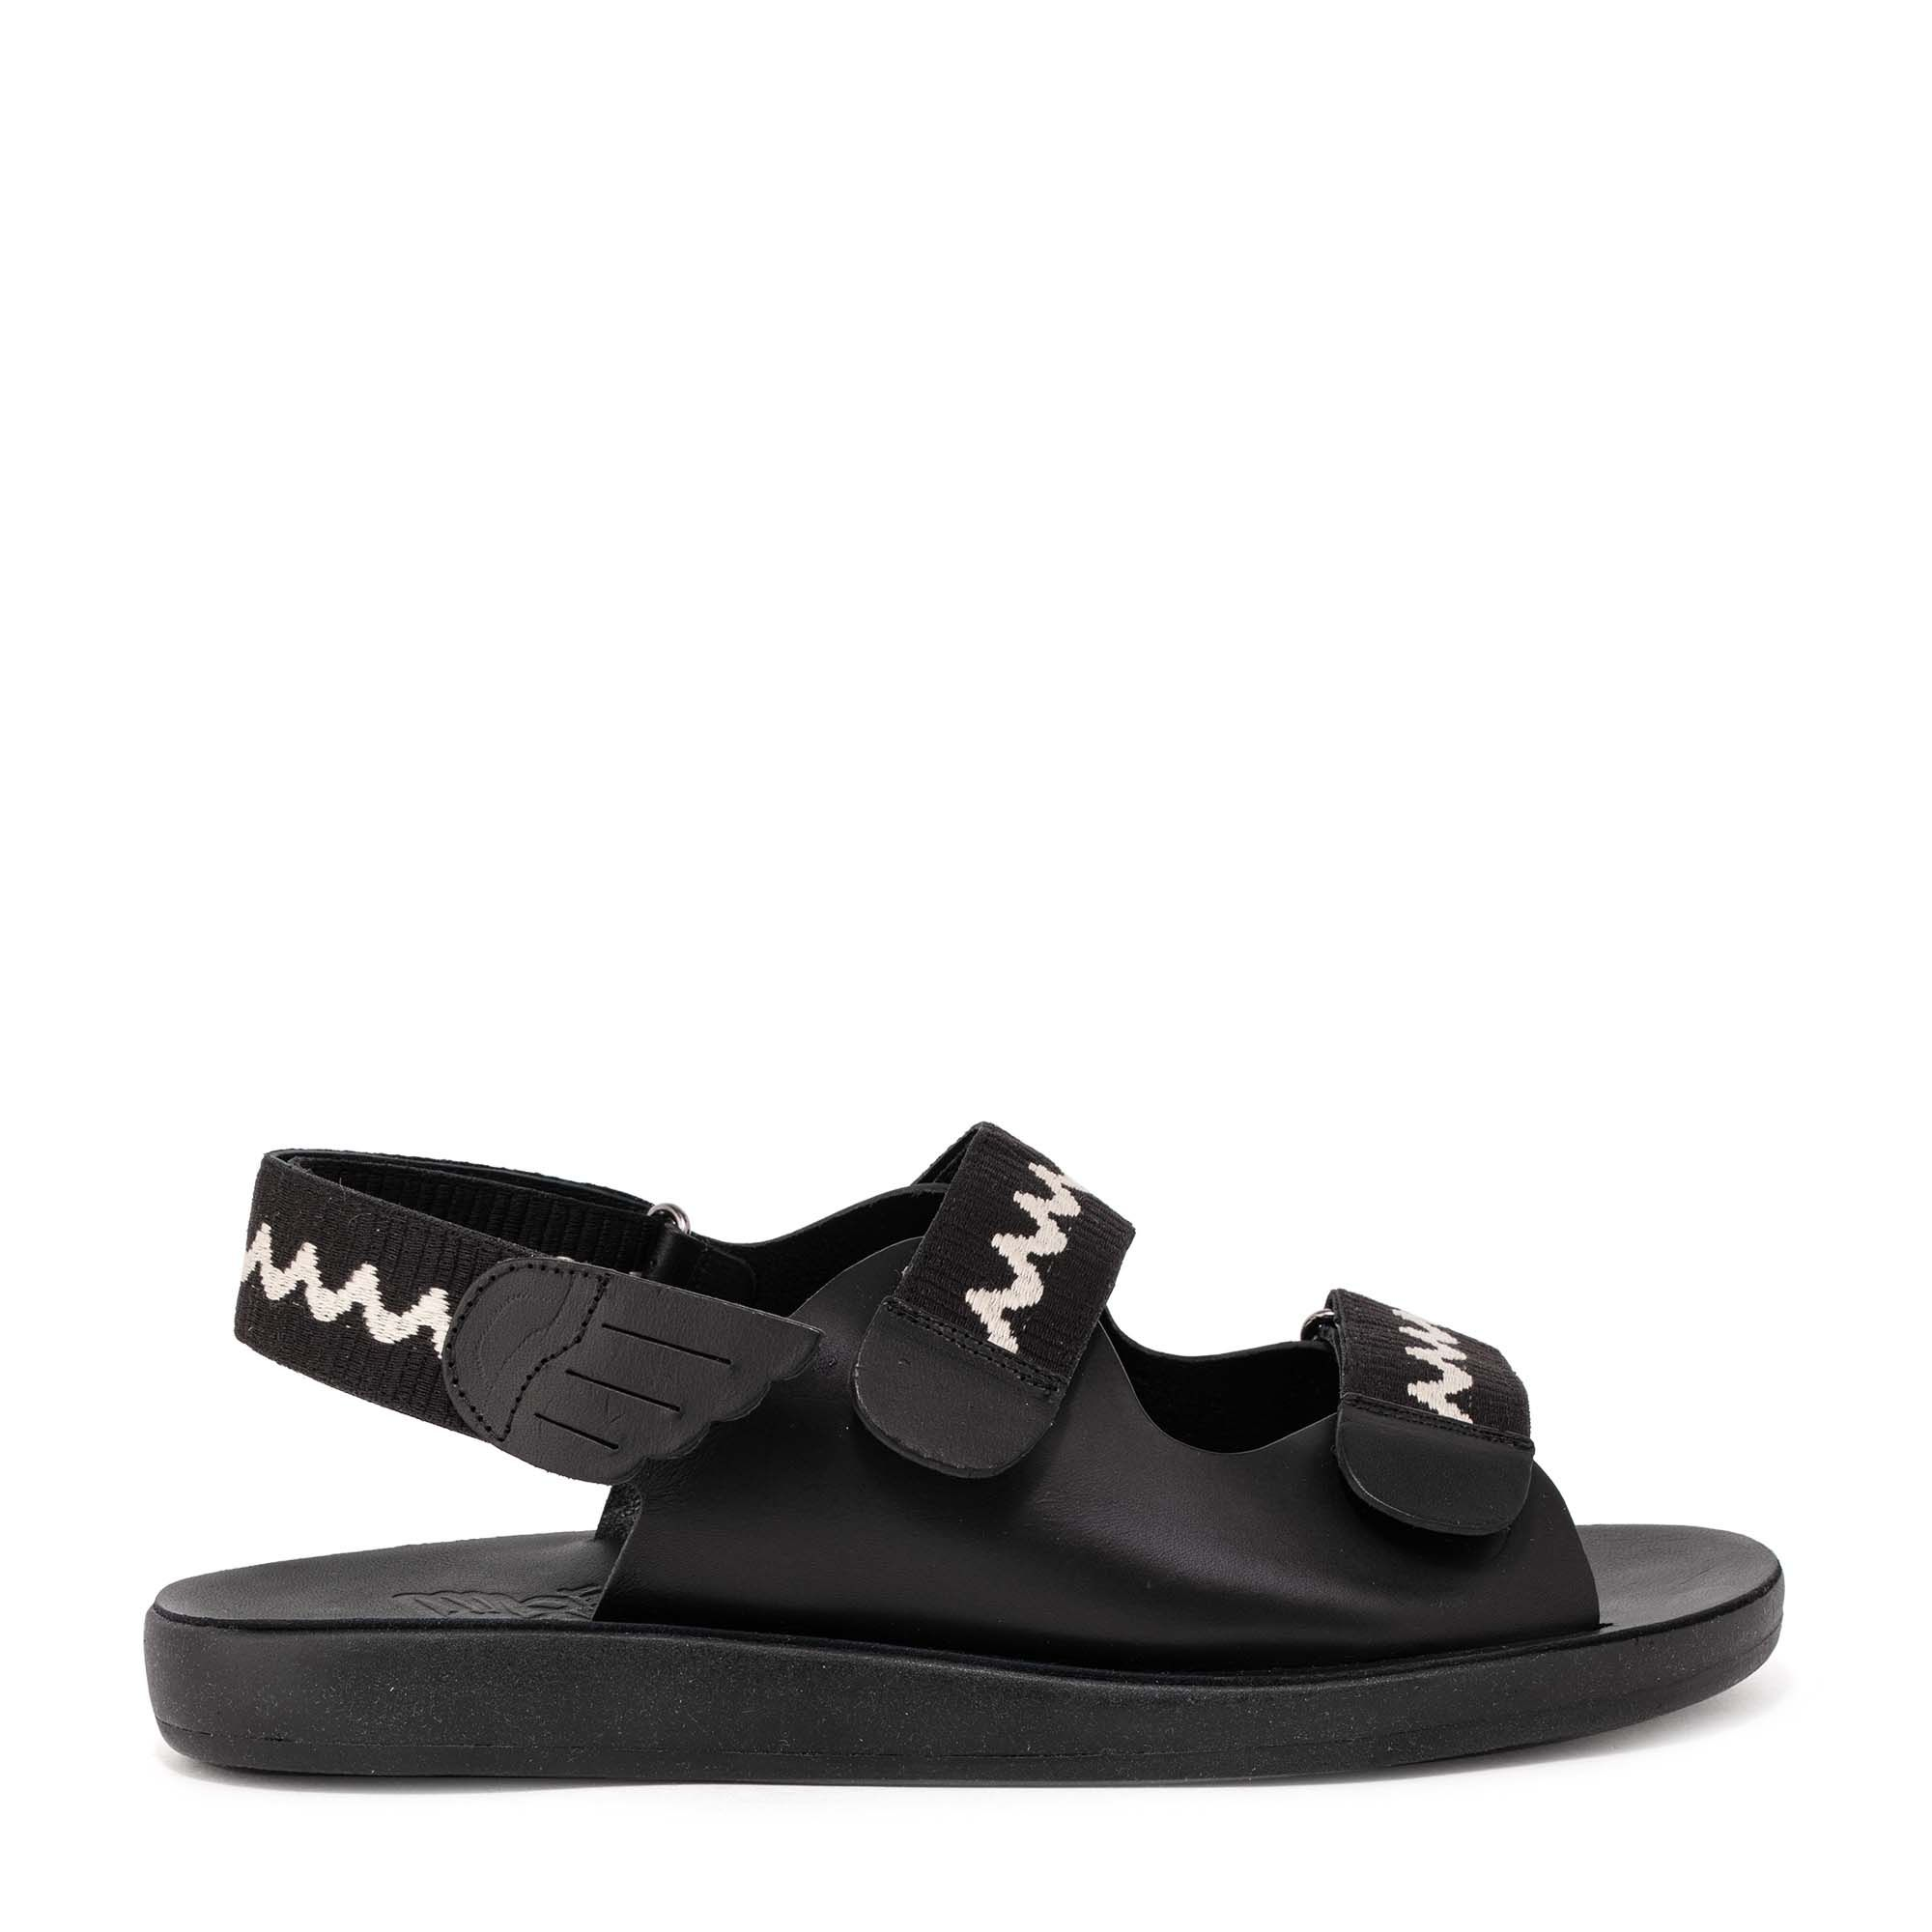 Olympos sandals